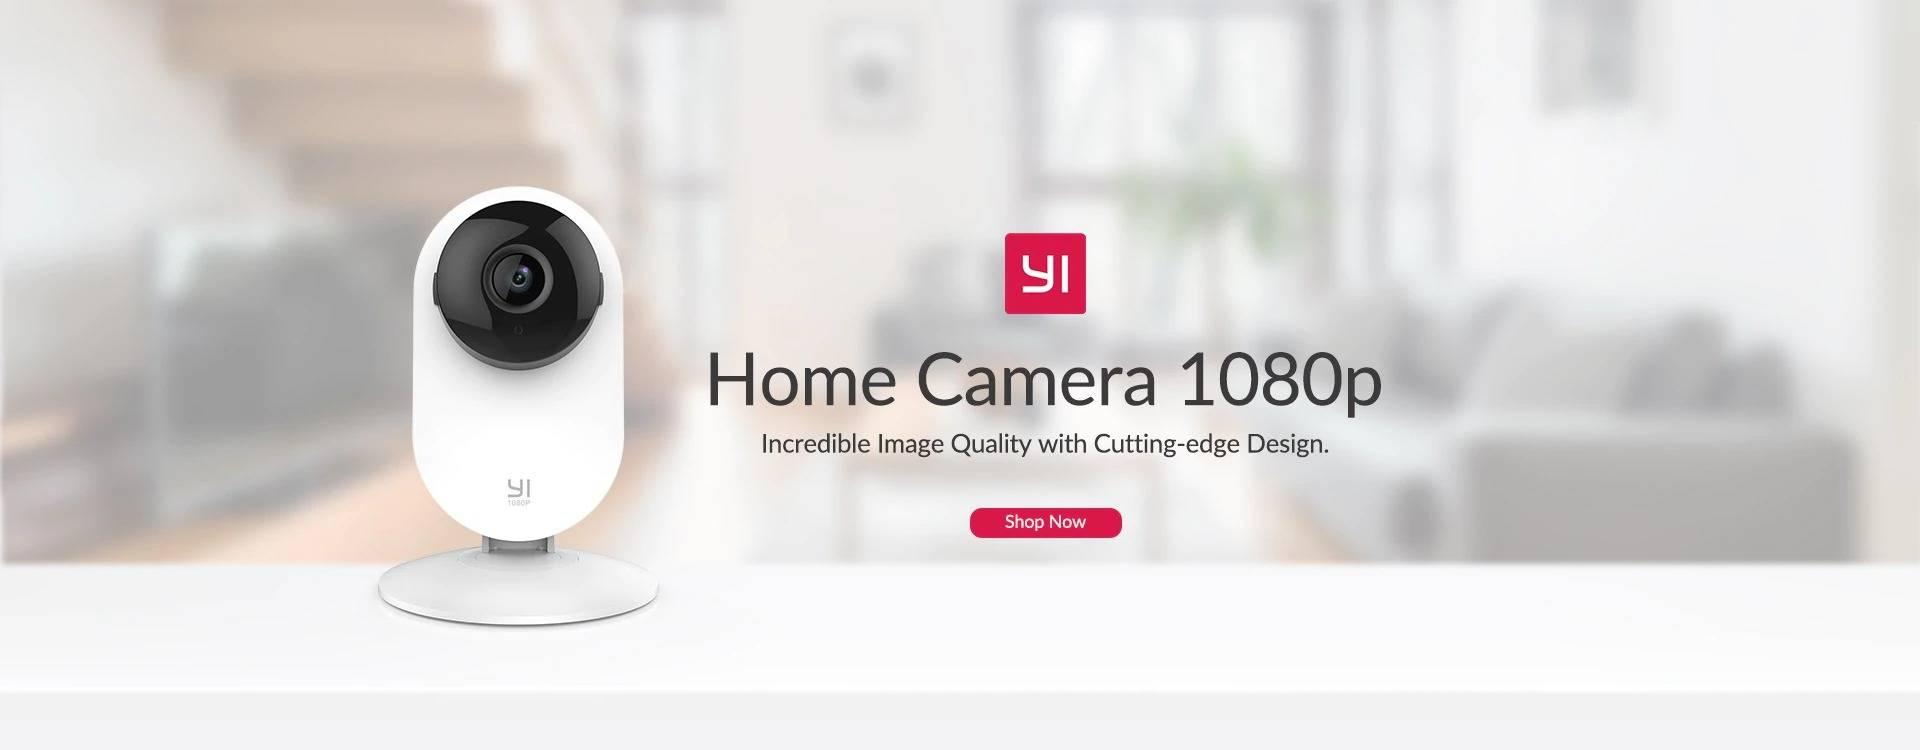 Yi 1080p Cameara